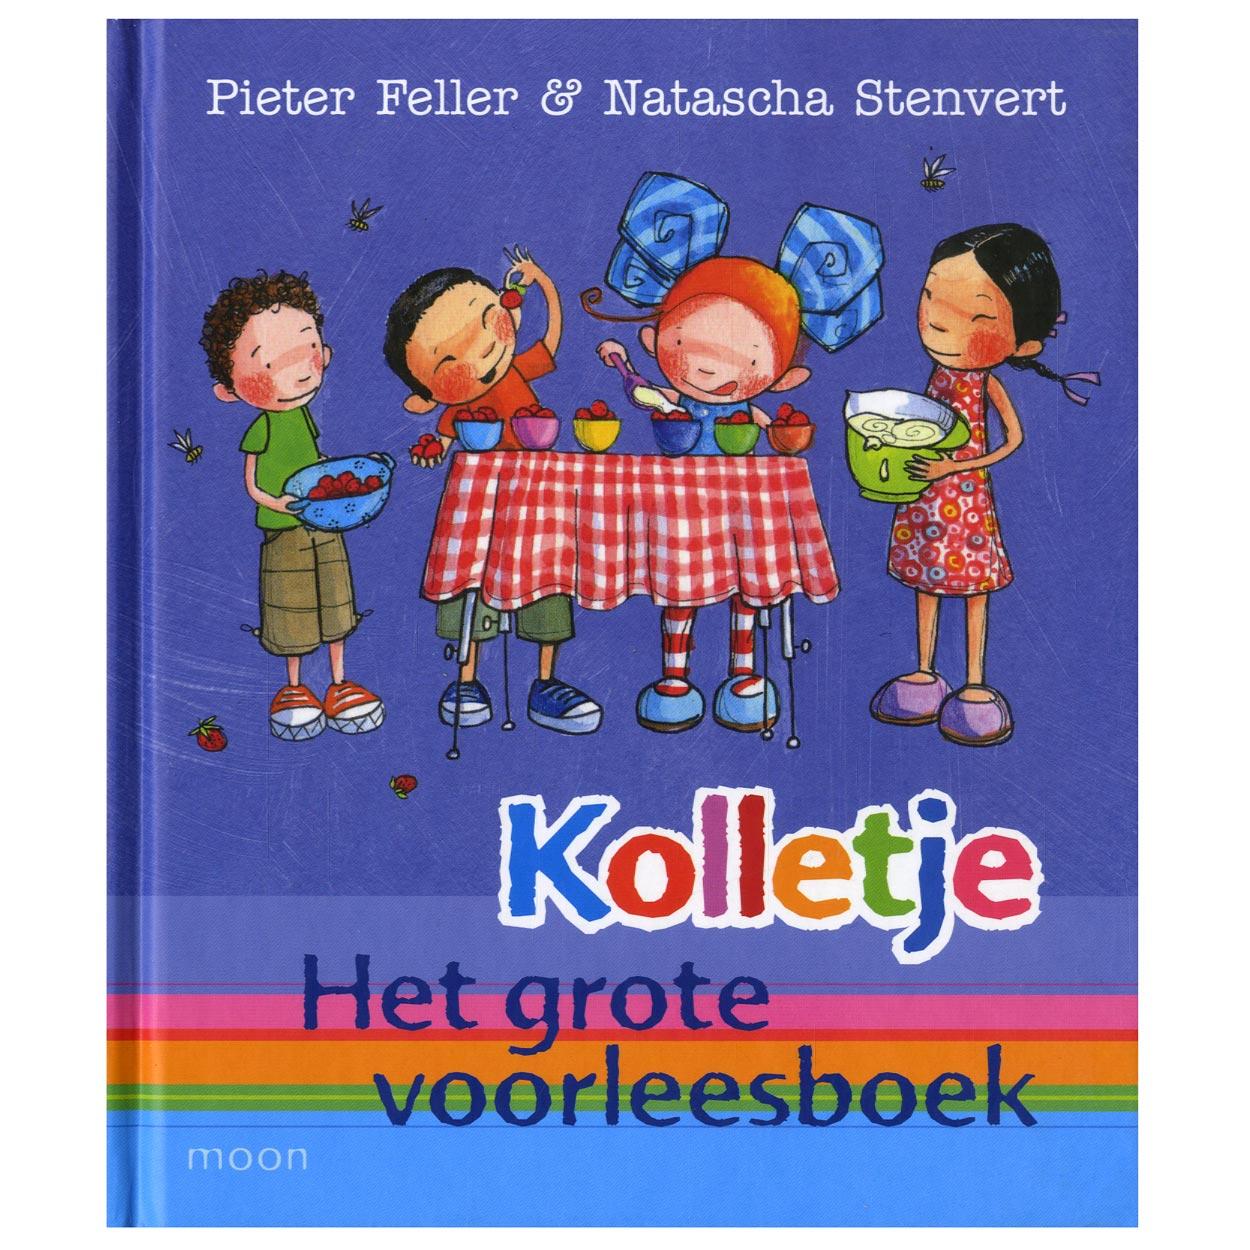 Kolletje Het grote voorleesboek online kopen | Lobbes.nl